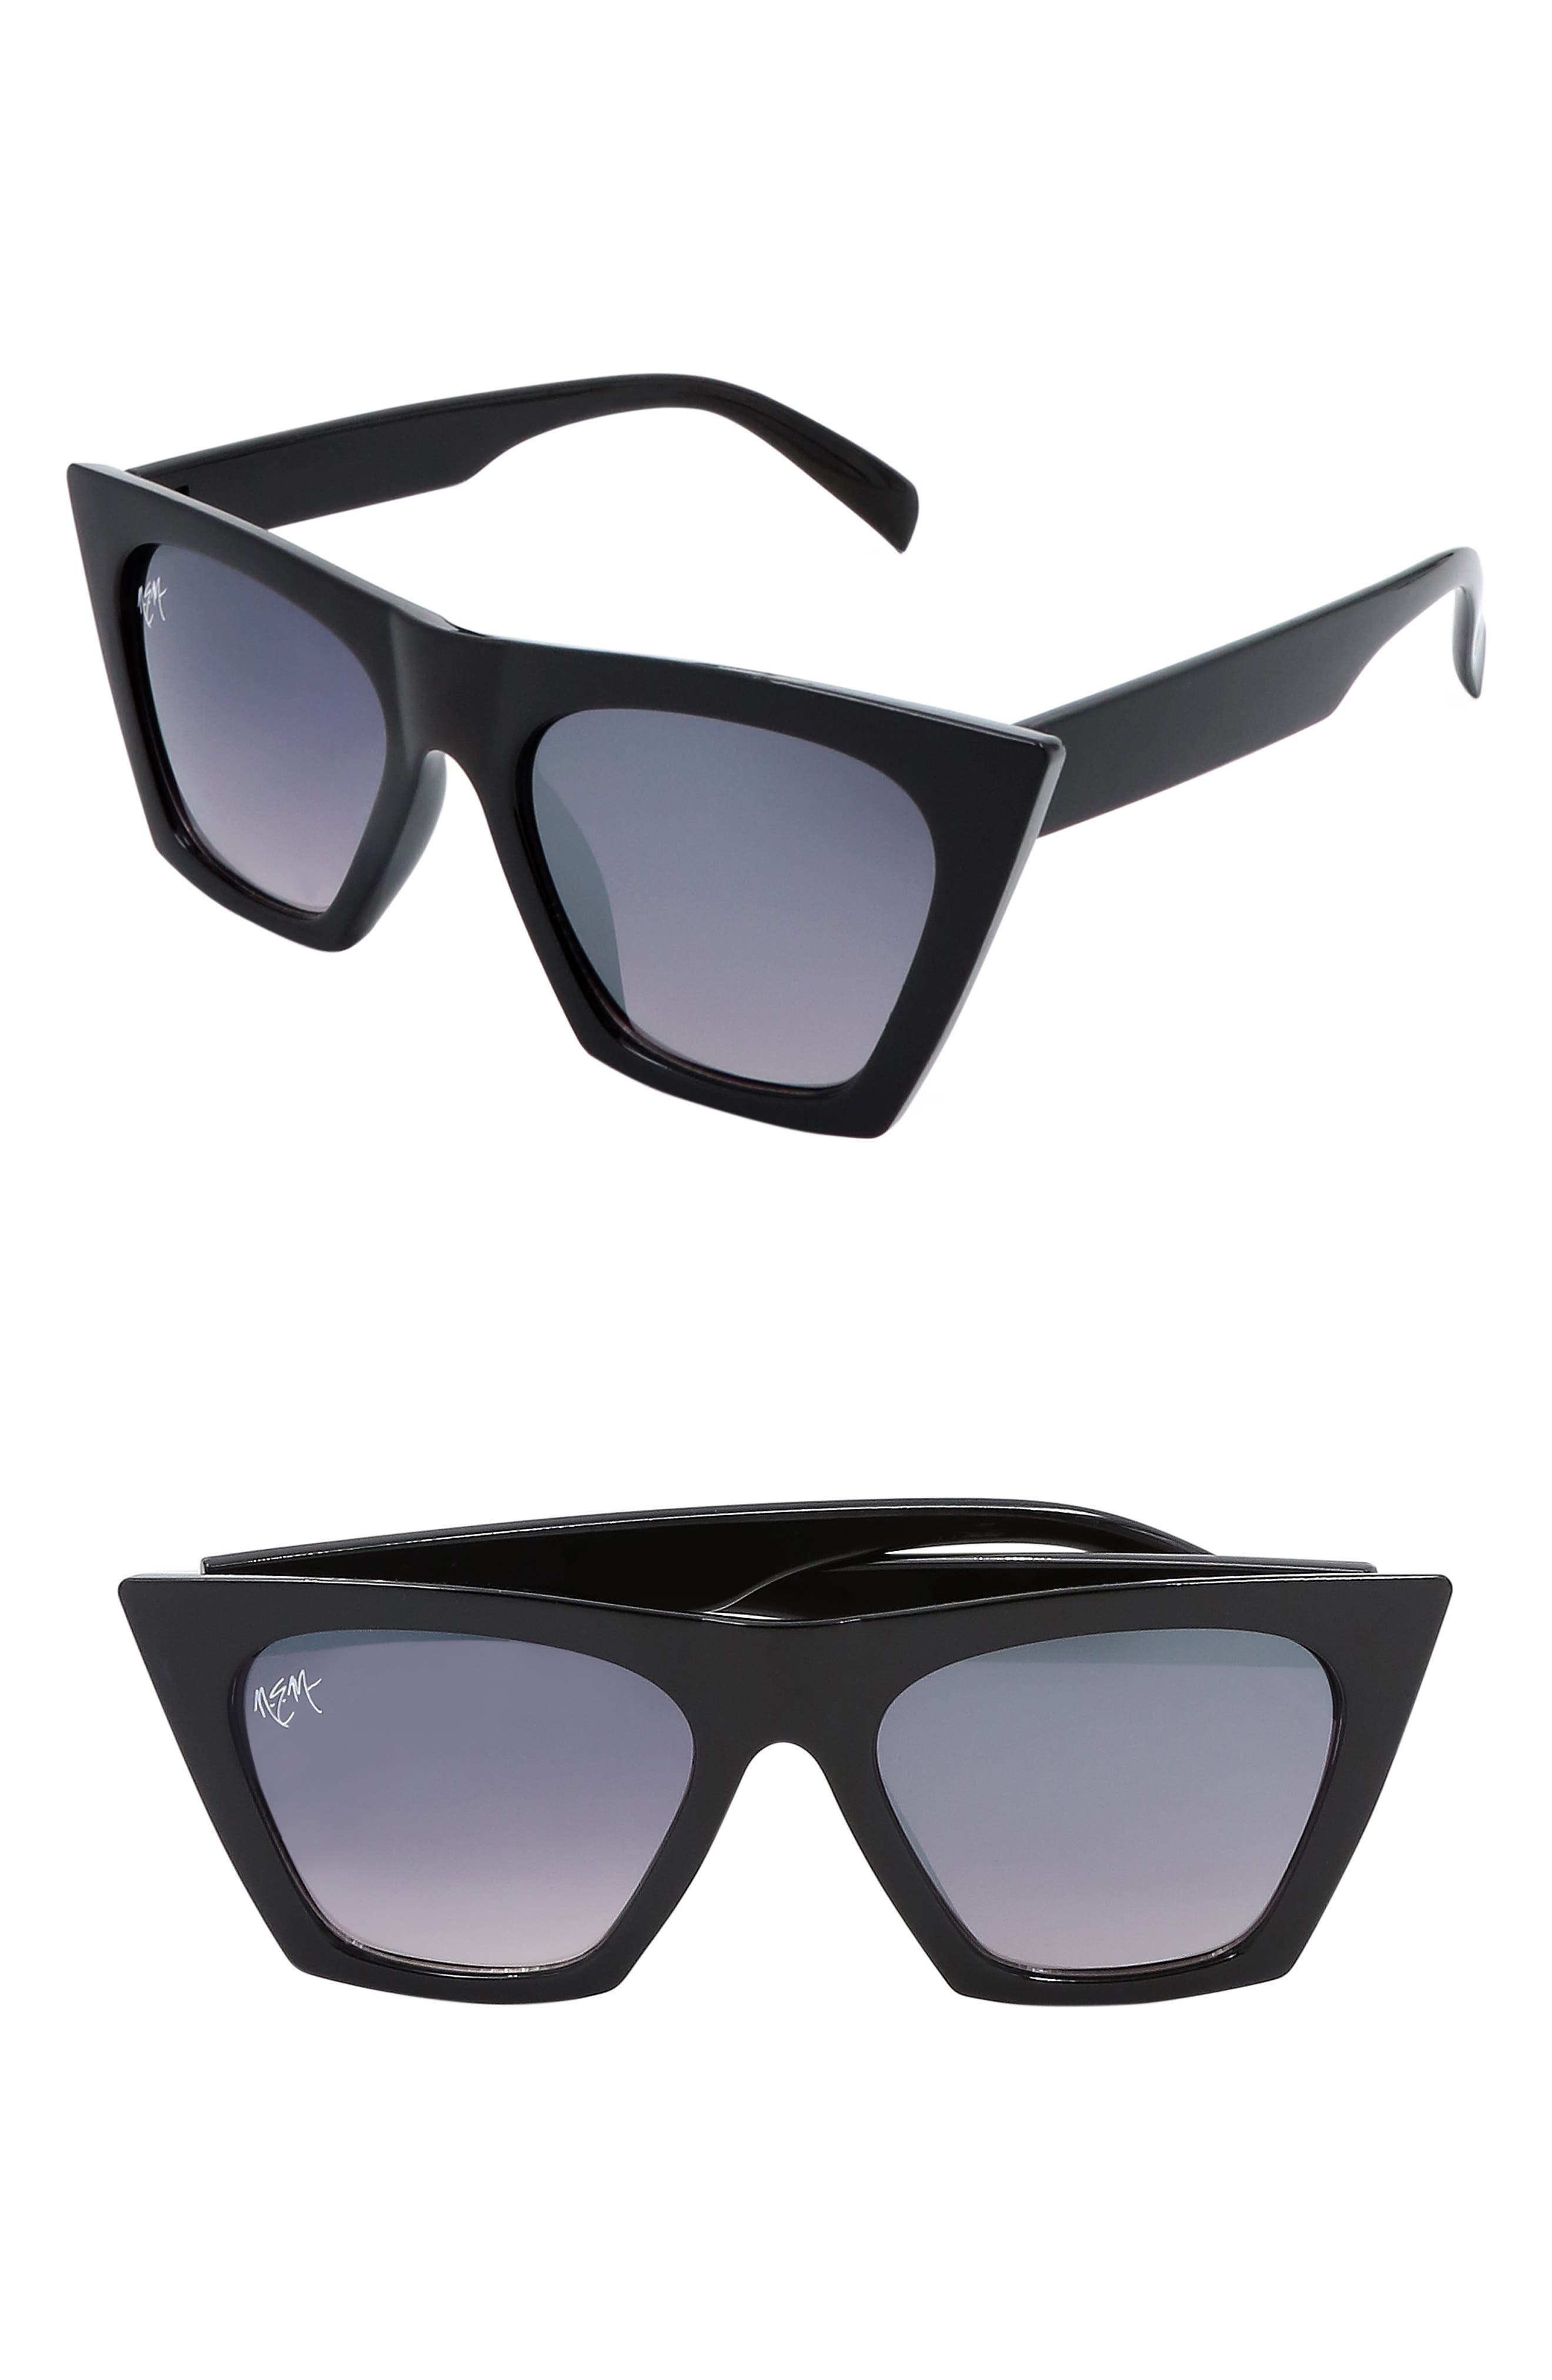 Retro Sunglasses | Vintage Glasses | New Vintage Eyeglasses Womens Nem Posh 50Mm Gradient Angular Sunglasses - Black W Grey Gradient Lens $65.00 AT vintagedancer.com